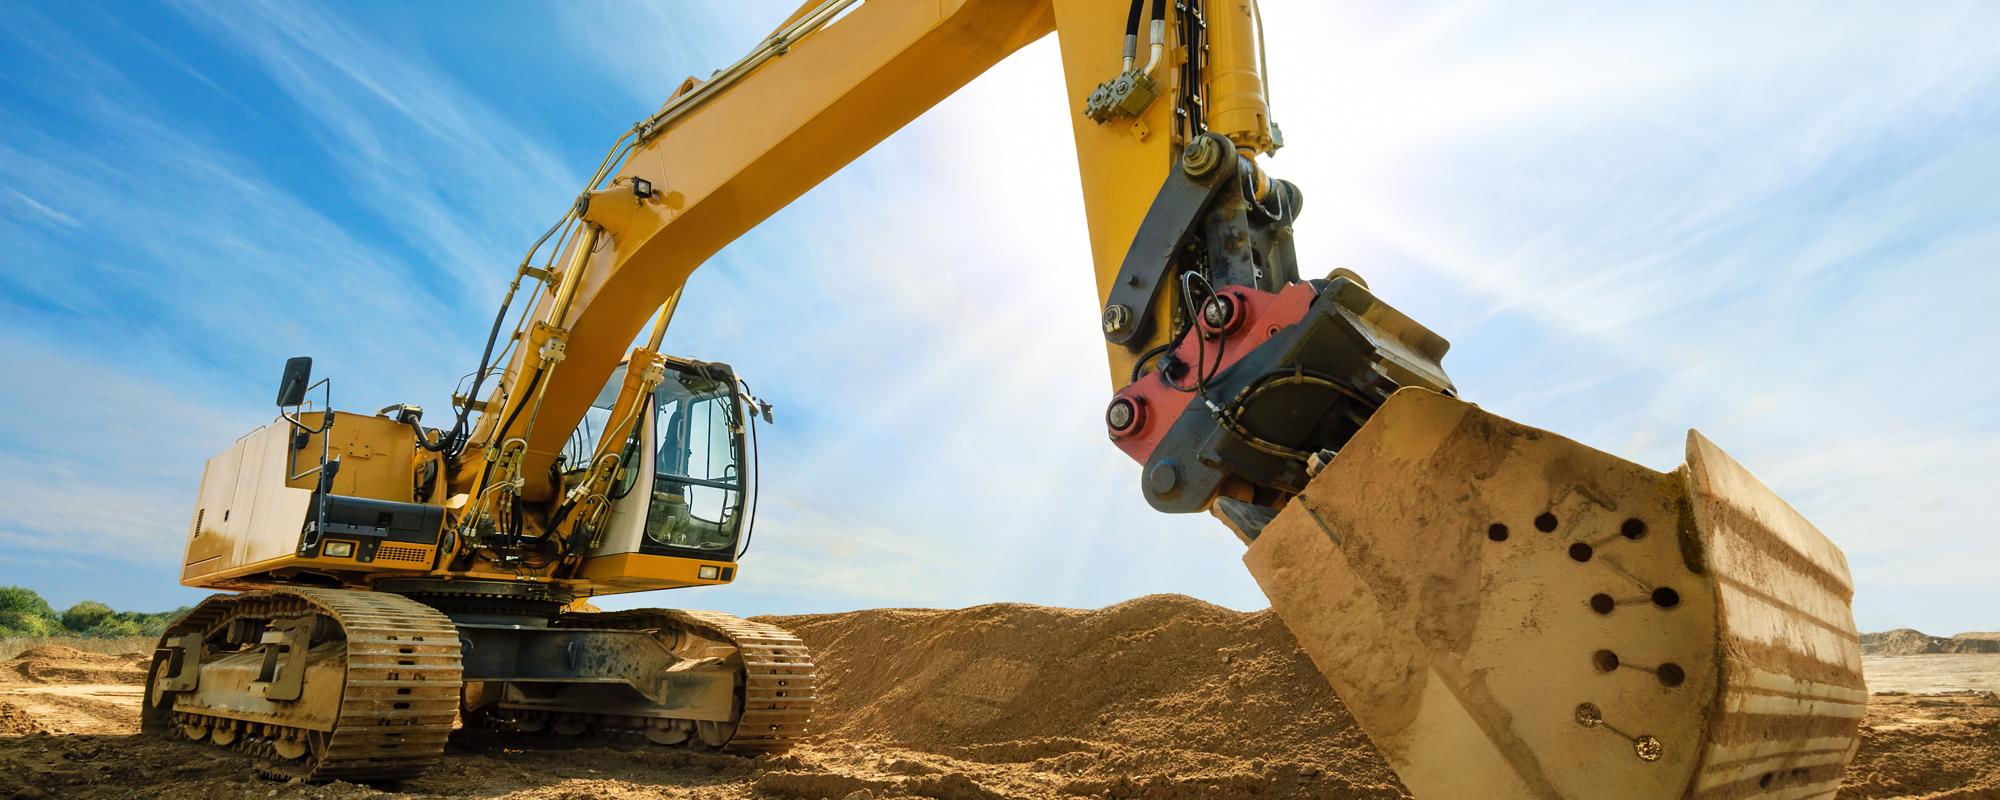 Heavy machine digging the ground